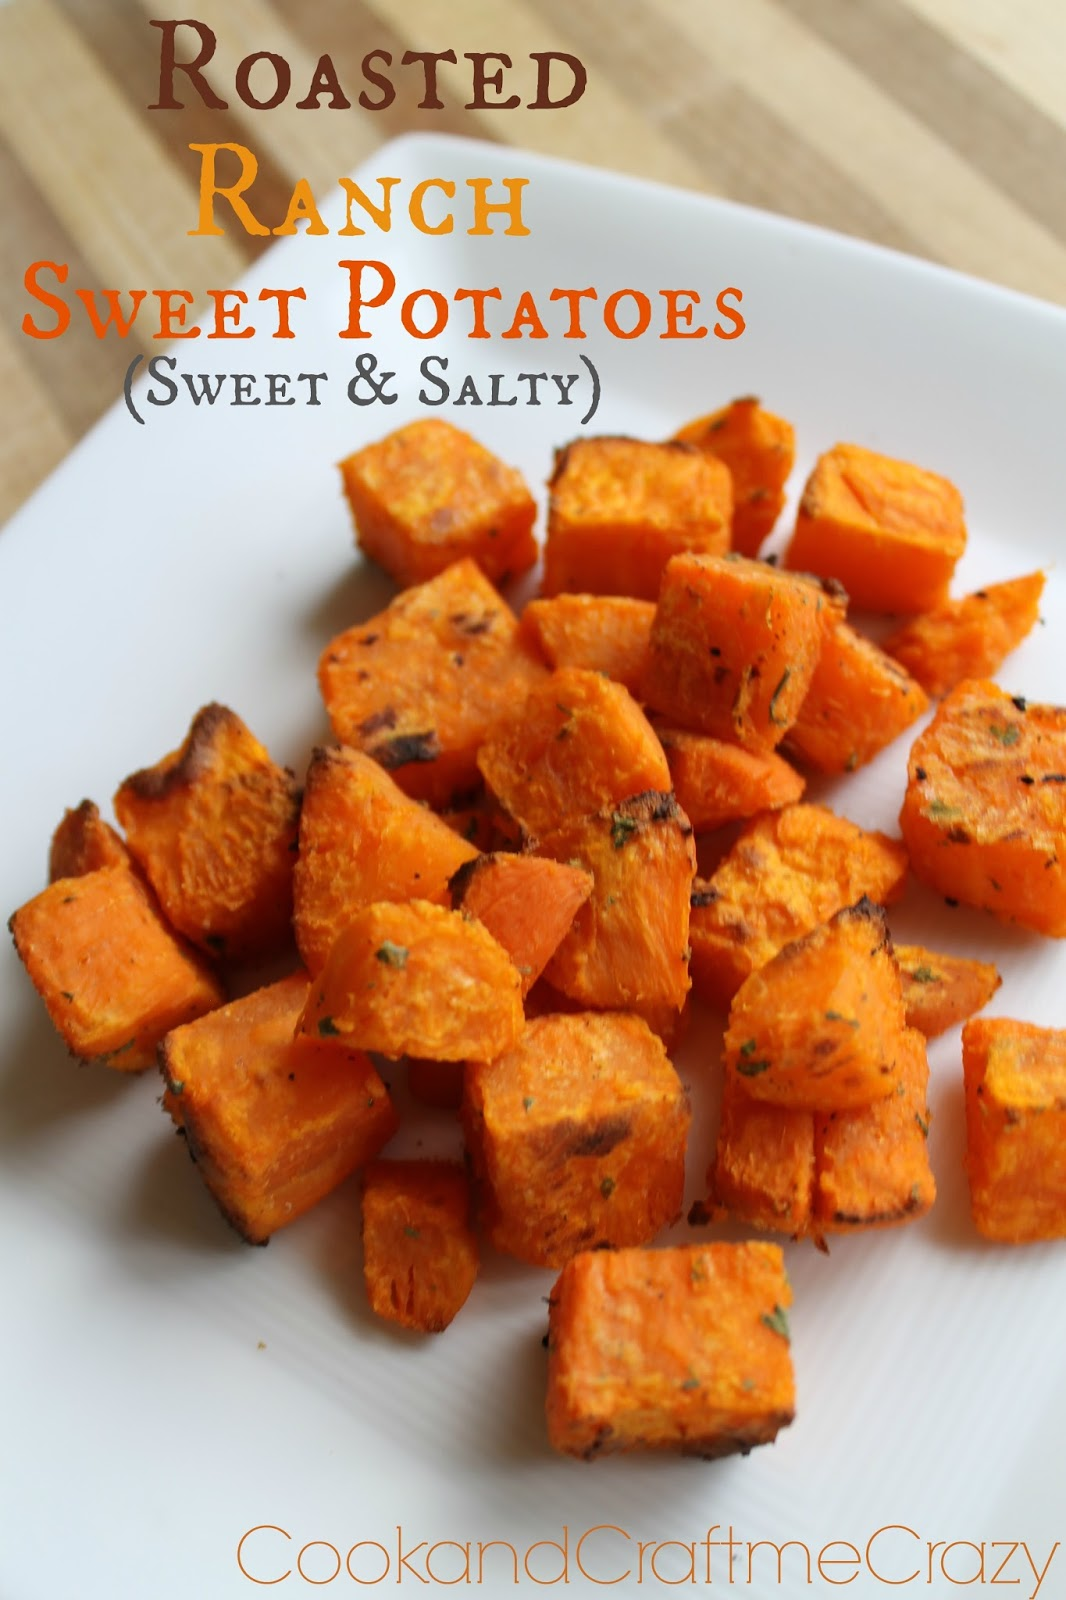 Roasted Ranch Sweet Potaotes